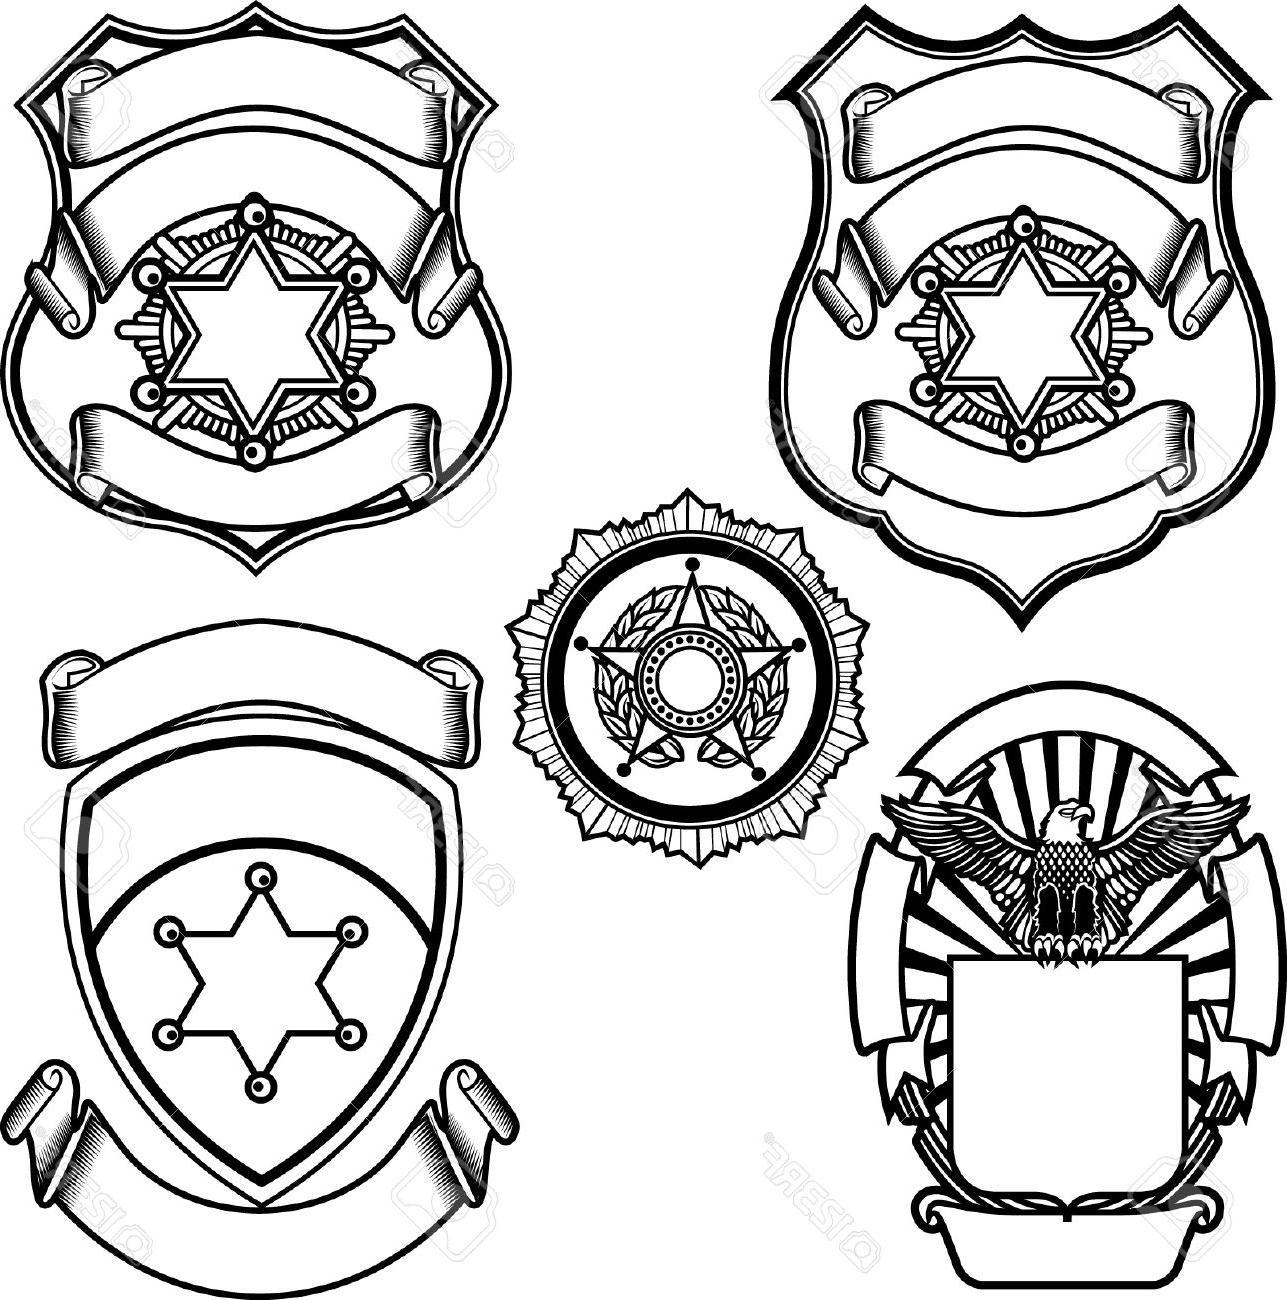 1287x1300 Hd Vector Illustration Of Sheriff Badge Stock Police Design